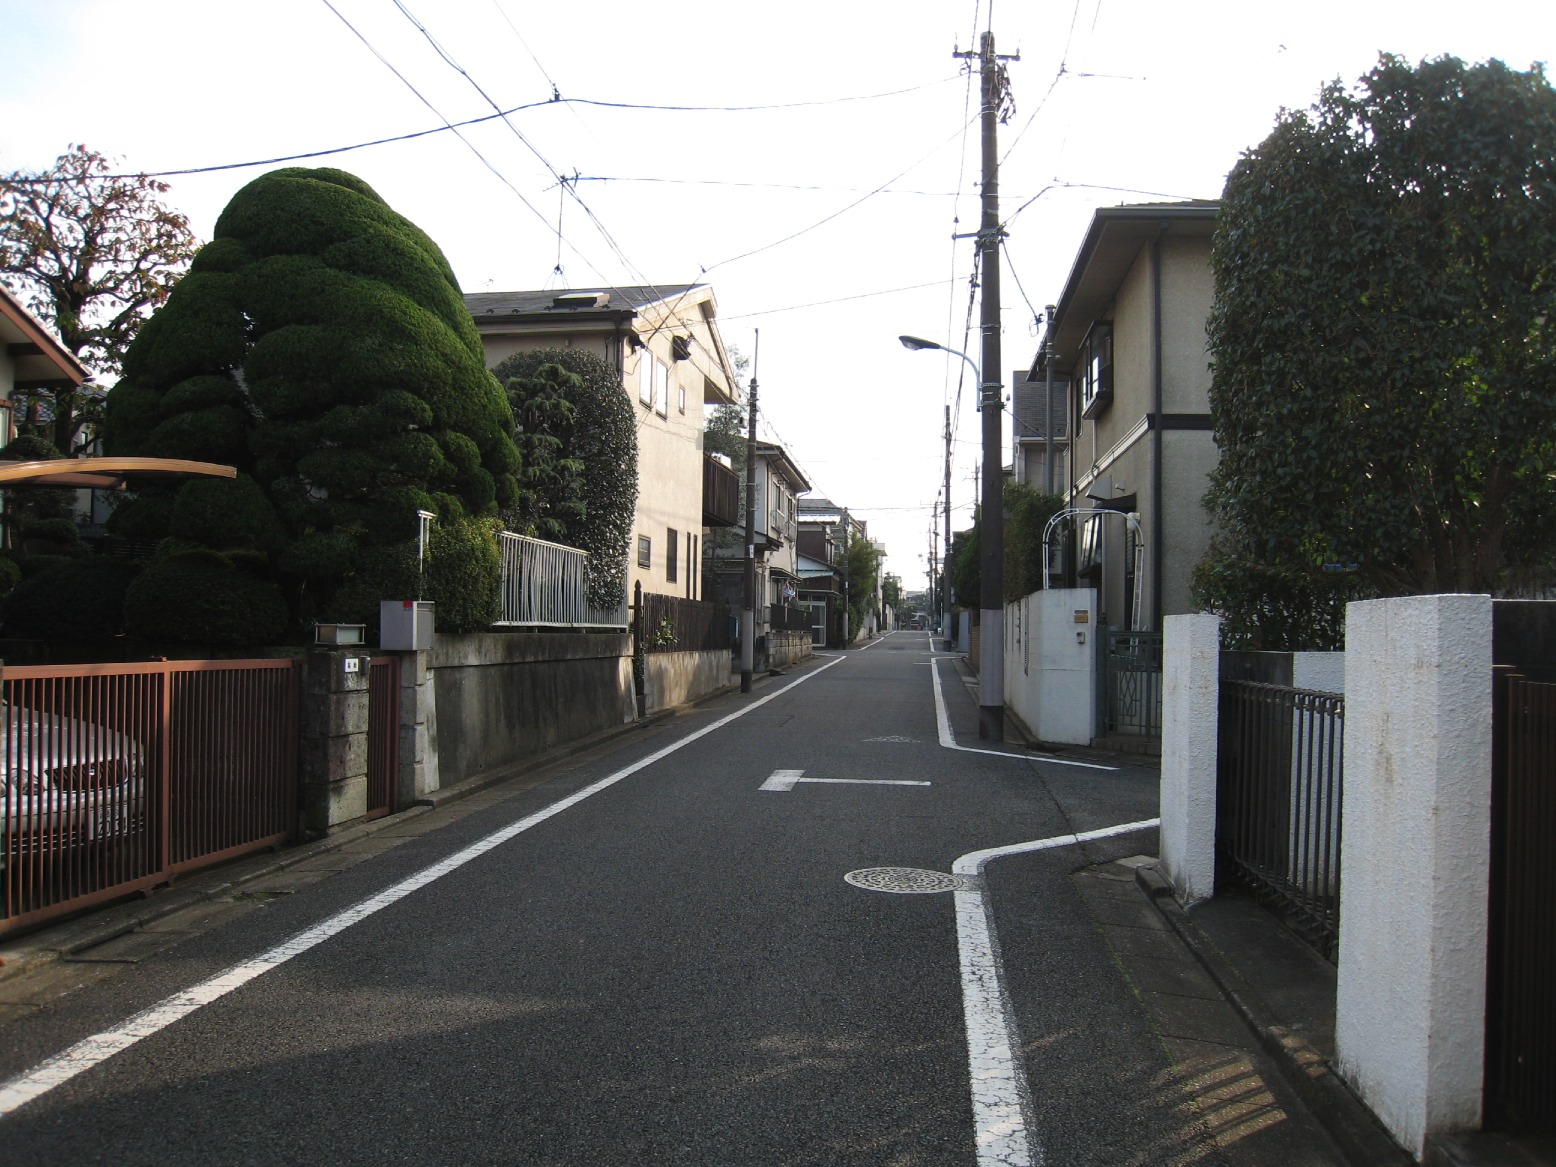 【散撮】町の風景  _f0141609_20413040.jpg